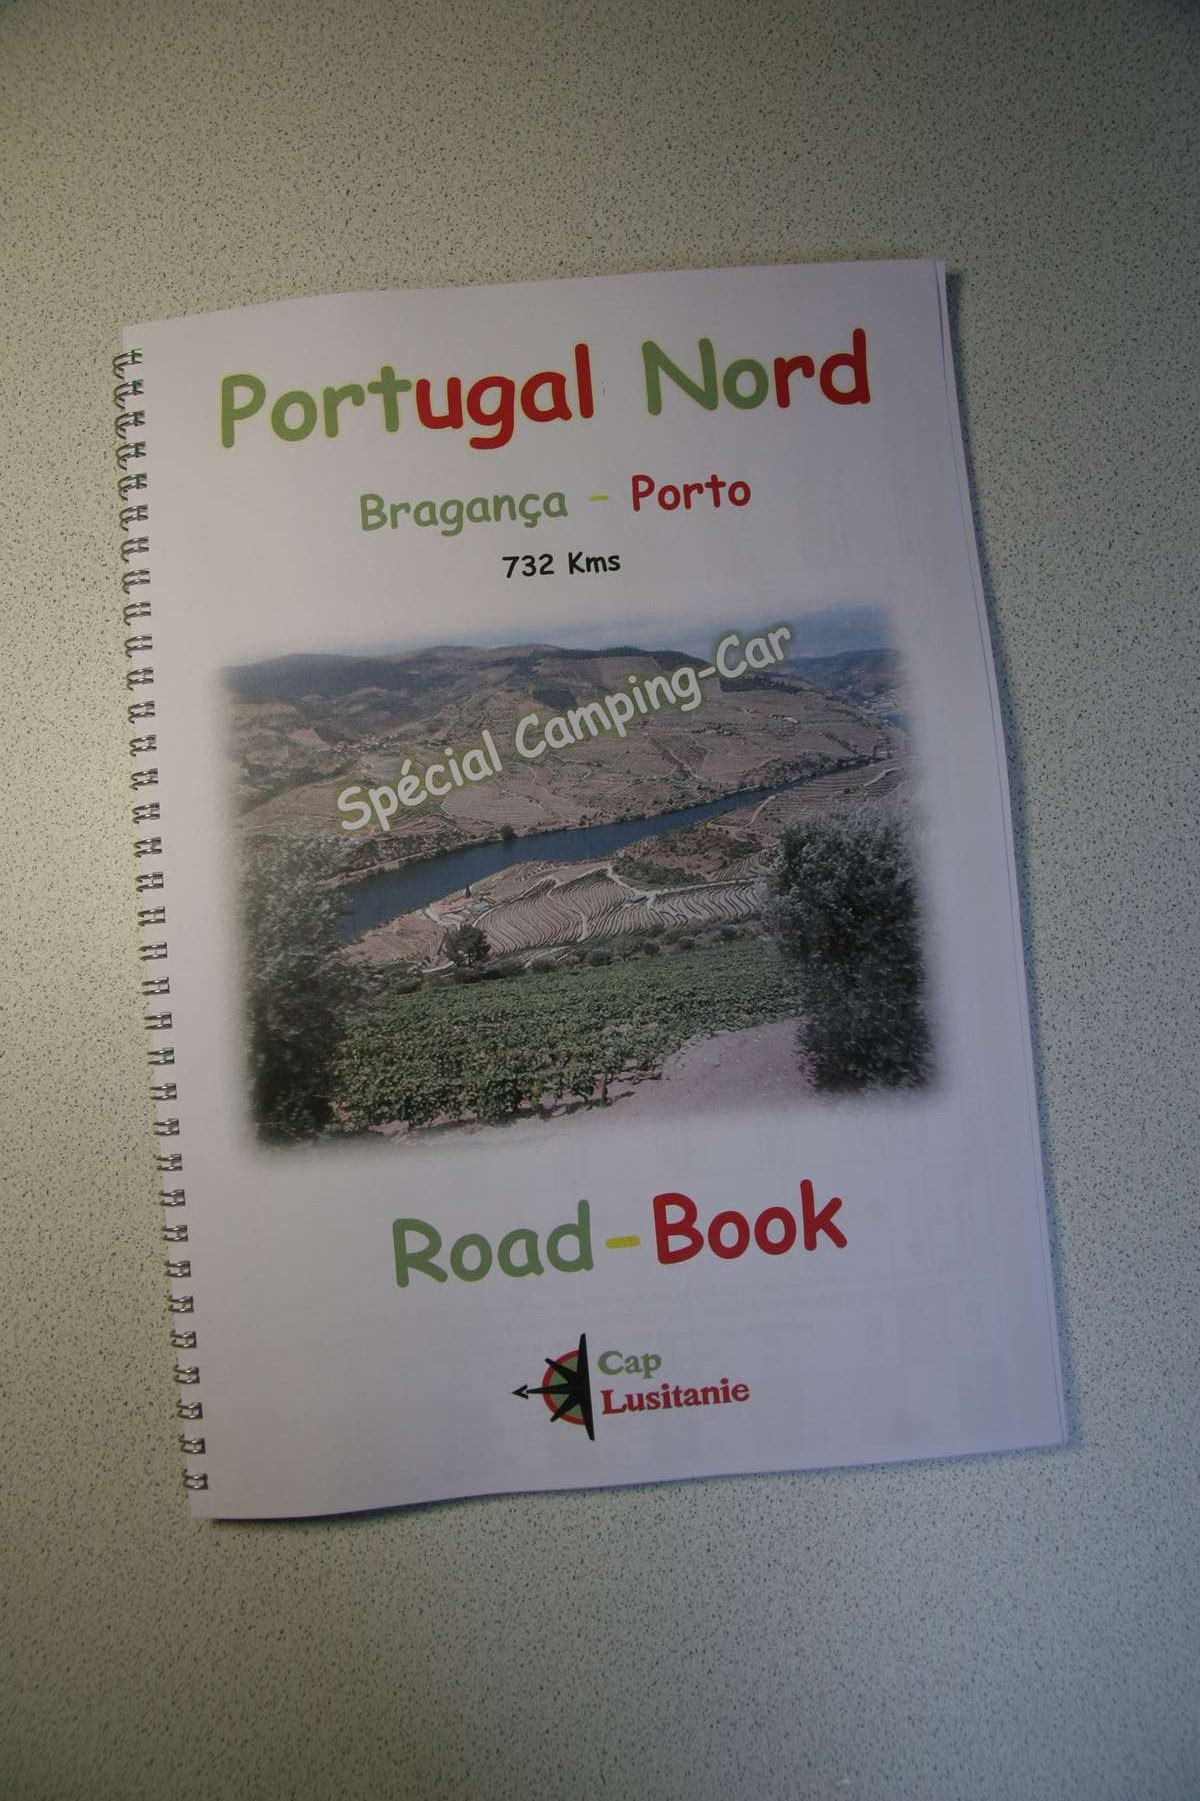 road book portugal 4x4. Black Bedroom Furniture Sets. Home Design Ideas